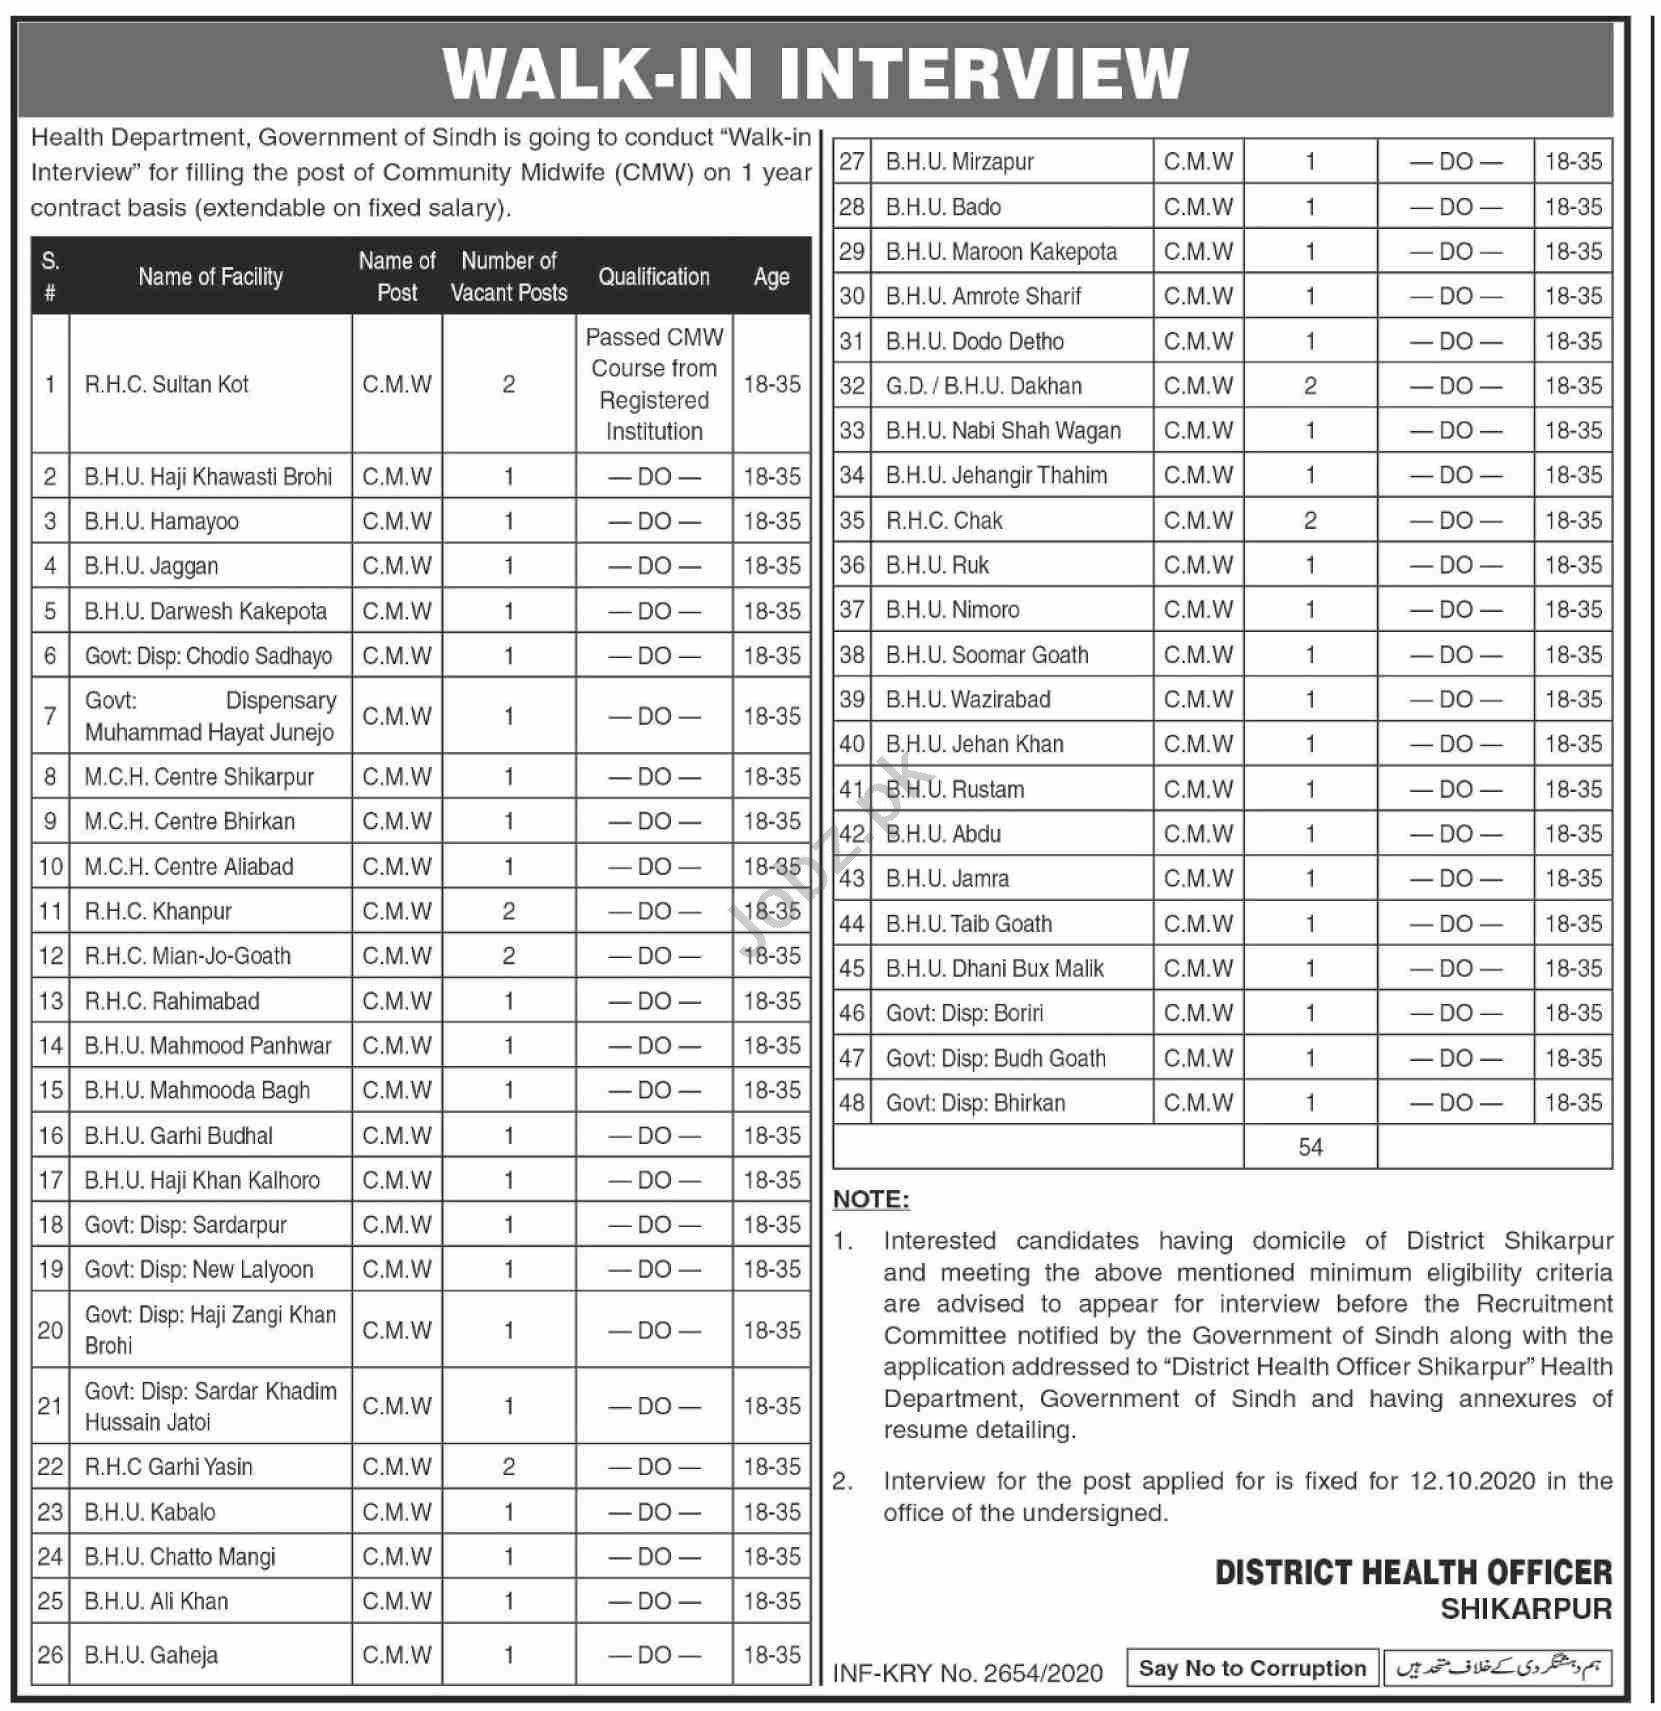 Health Department Shikarpur Jobs Interview 2020